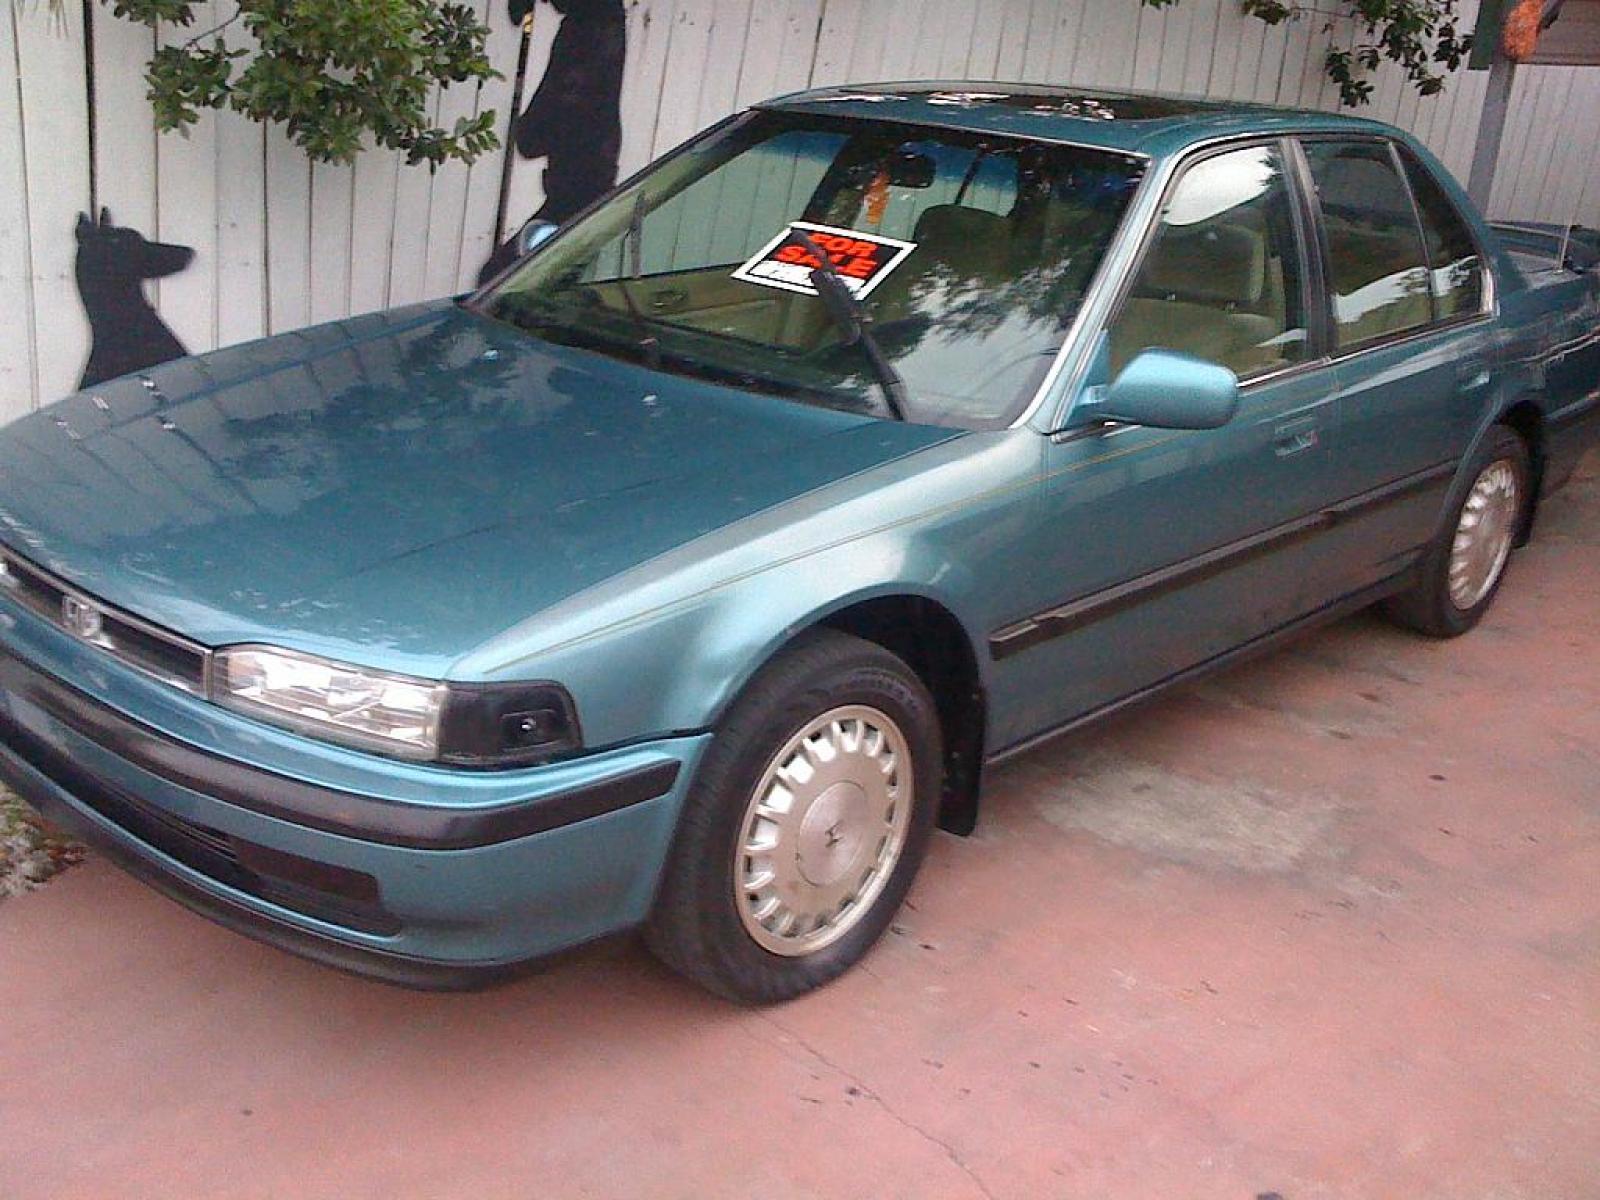 800 1024 1280 1600 origin 1991 Honda Accord ...